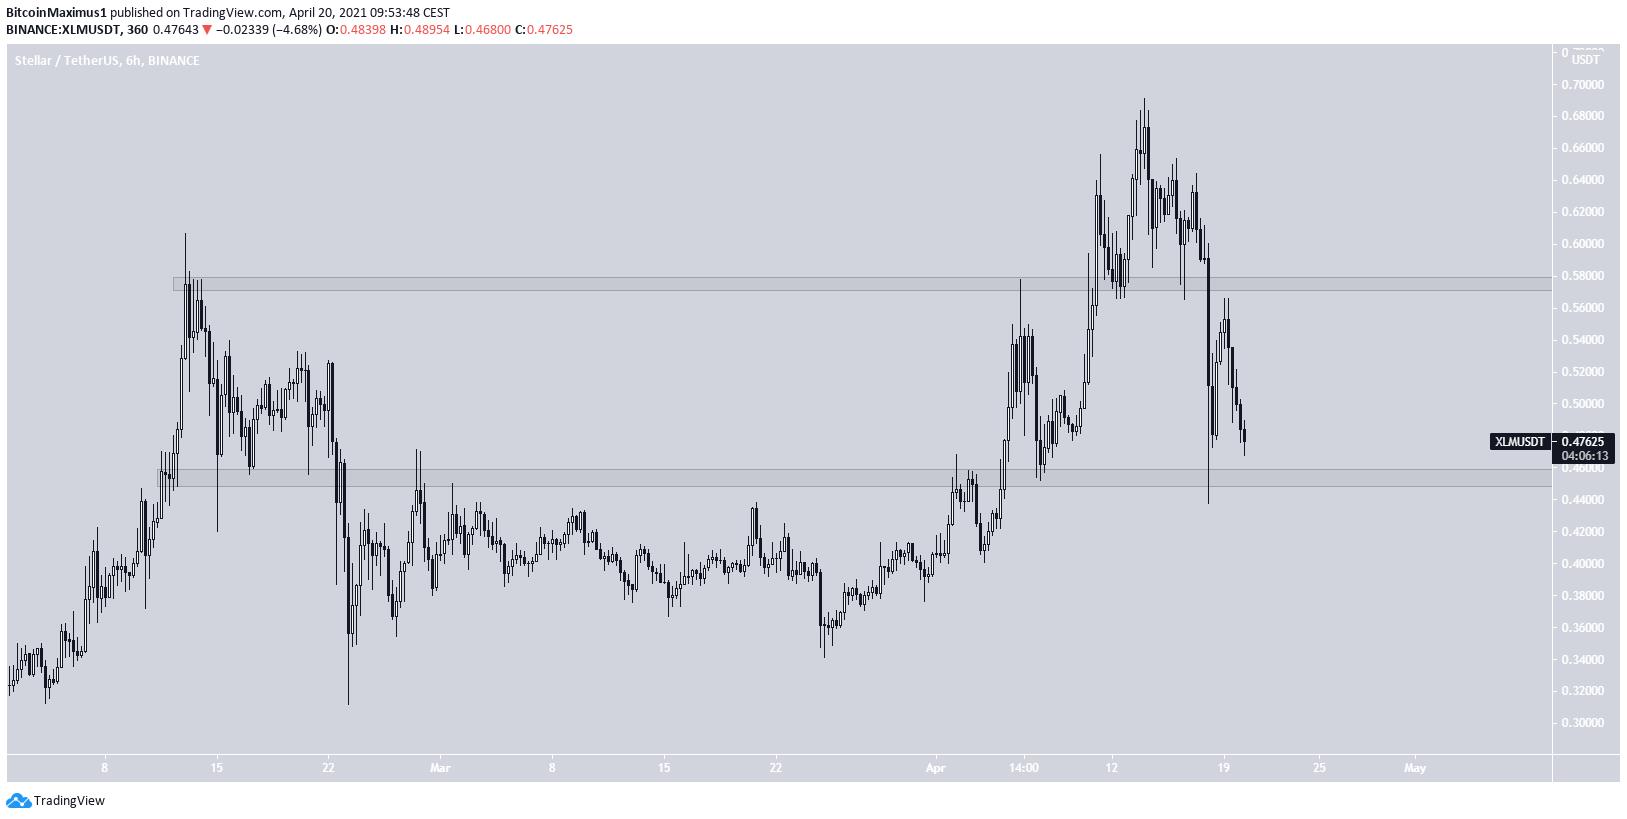 XLM Trading Range